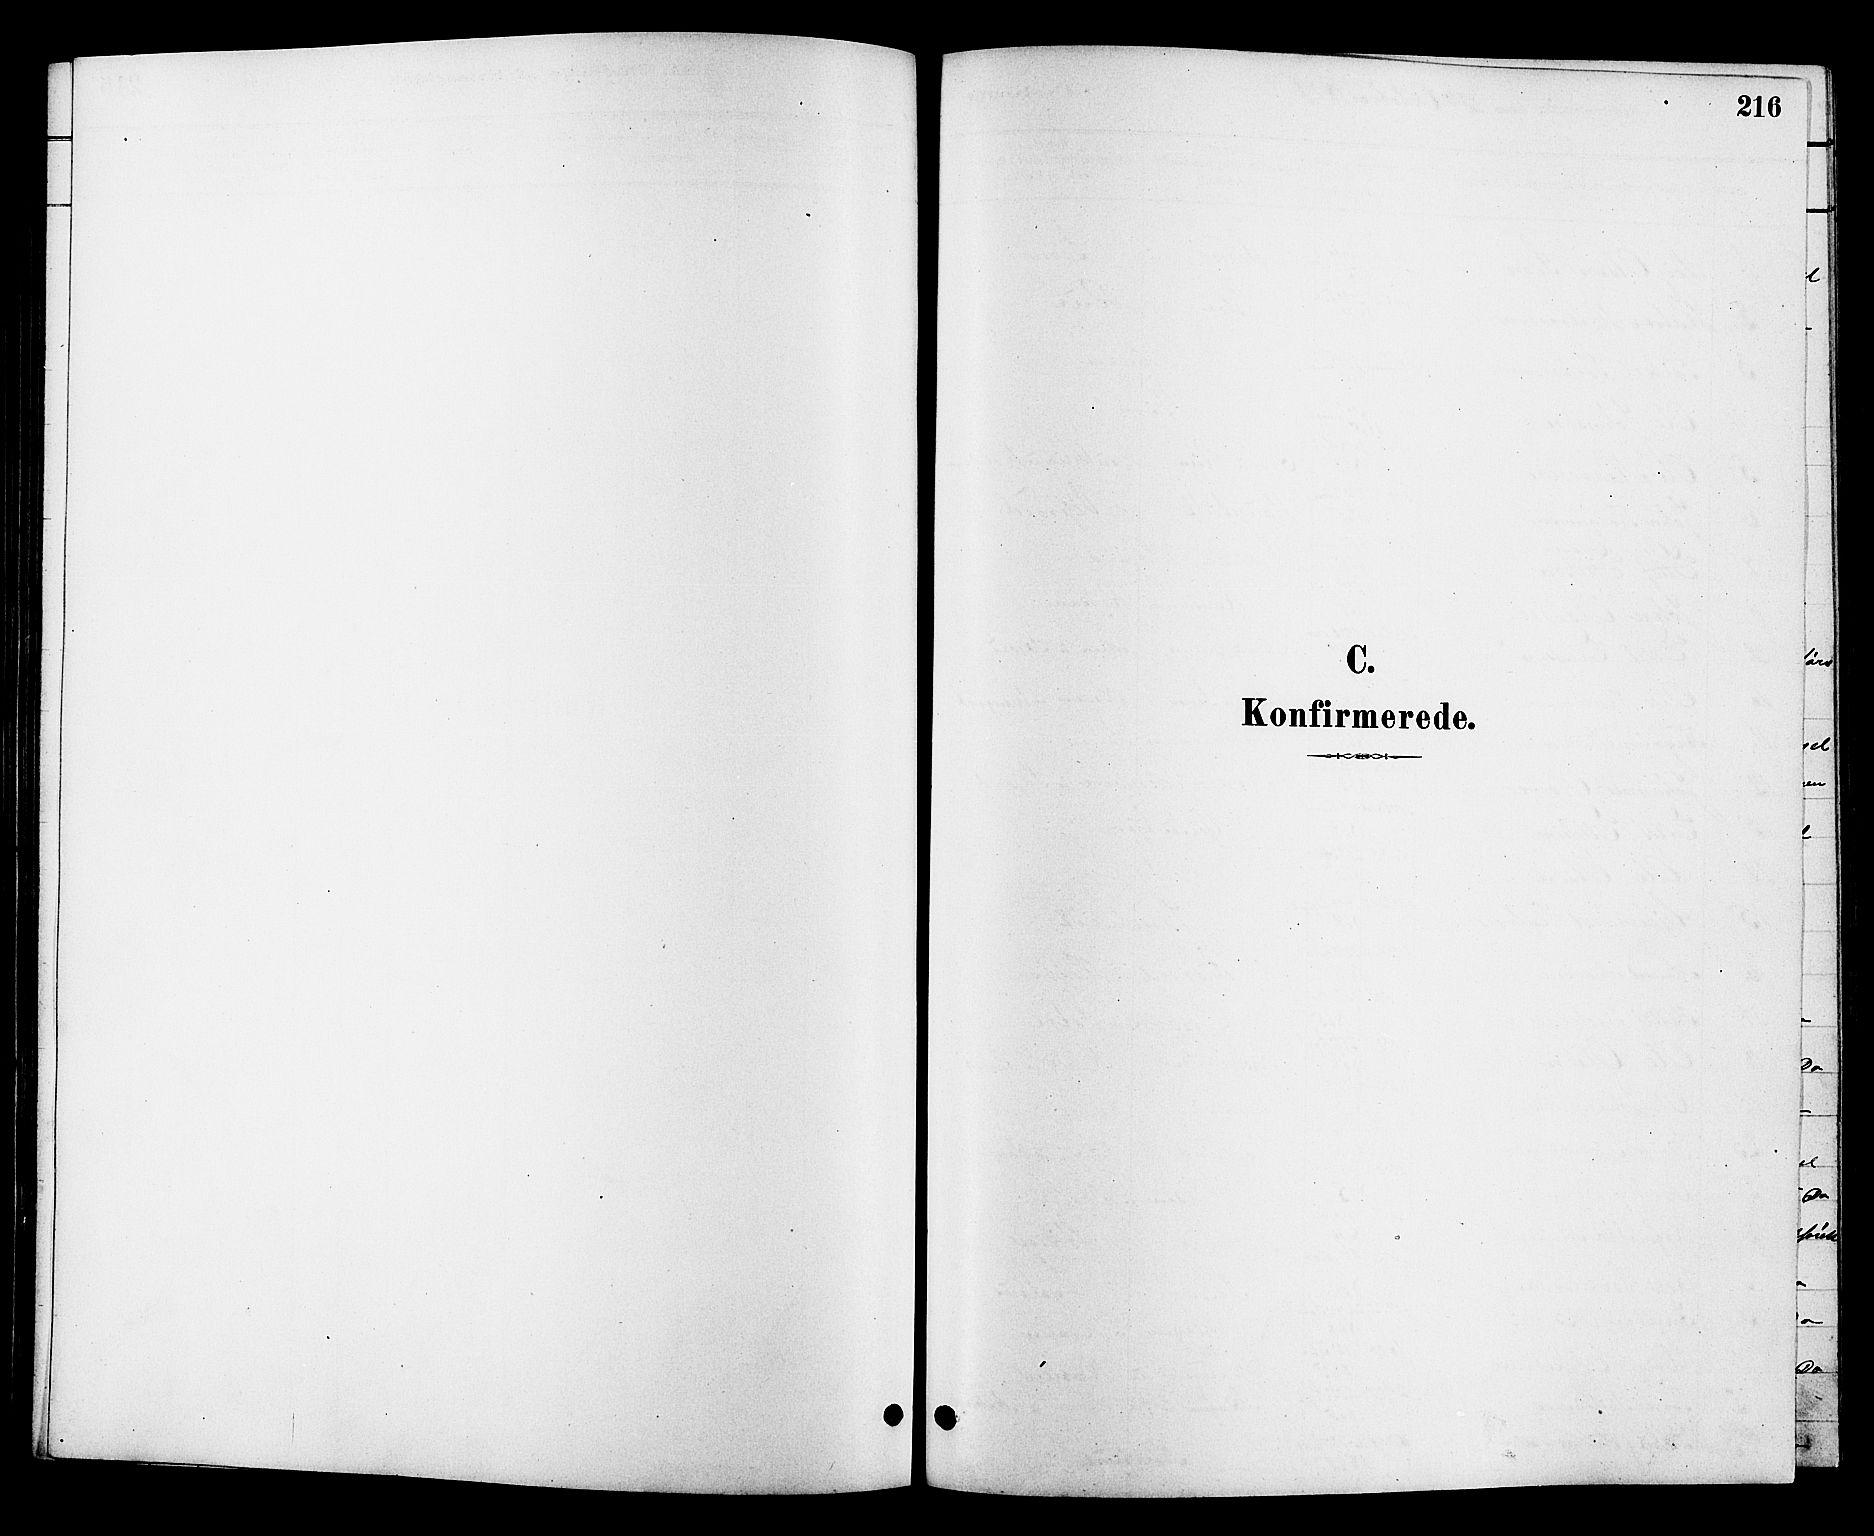 SAKO, Heddal kirkebøker, G/Ga/L0002: Klokkerbok nr. I 2, 1879-1908, s. 216